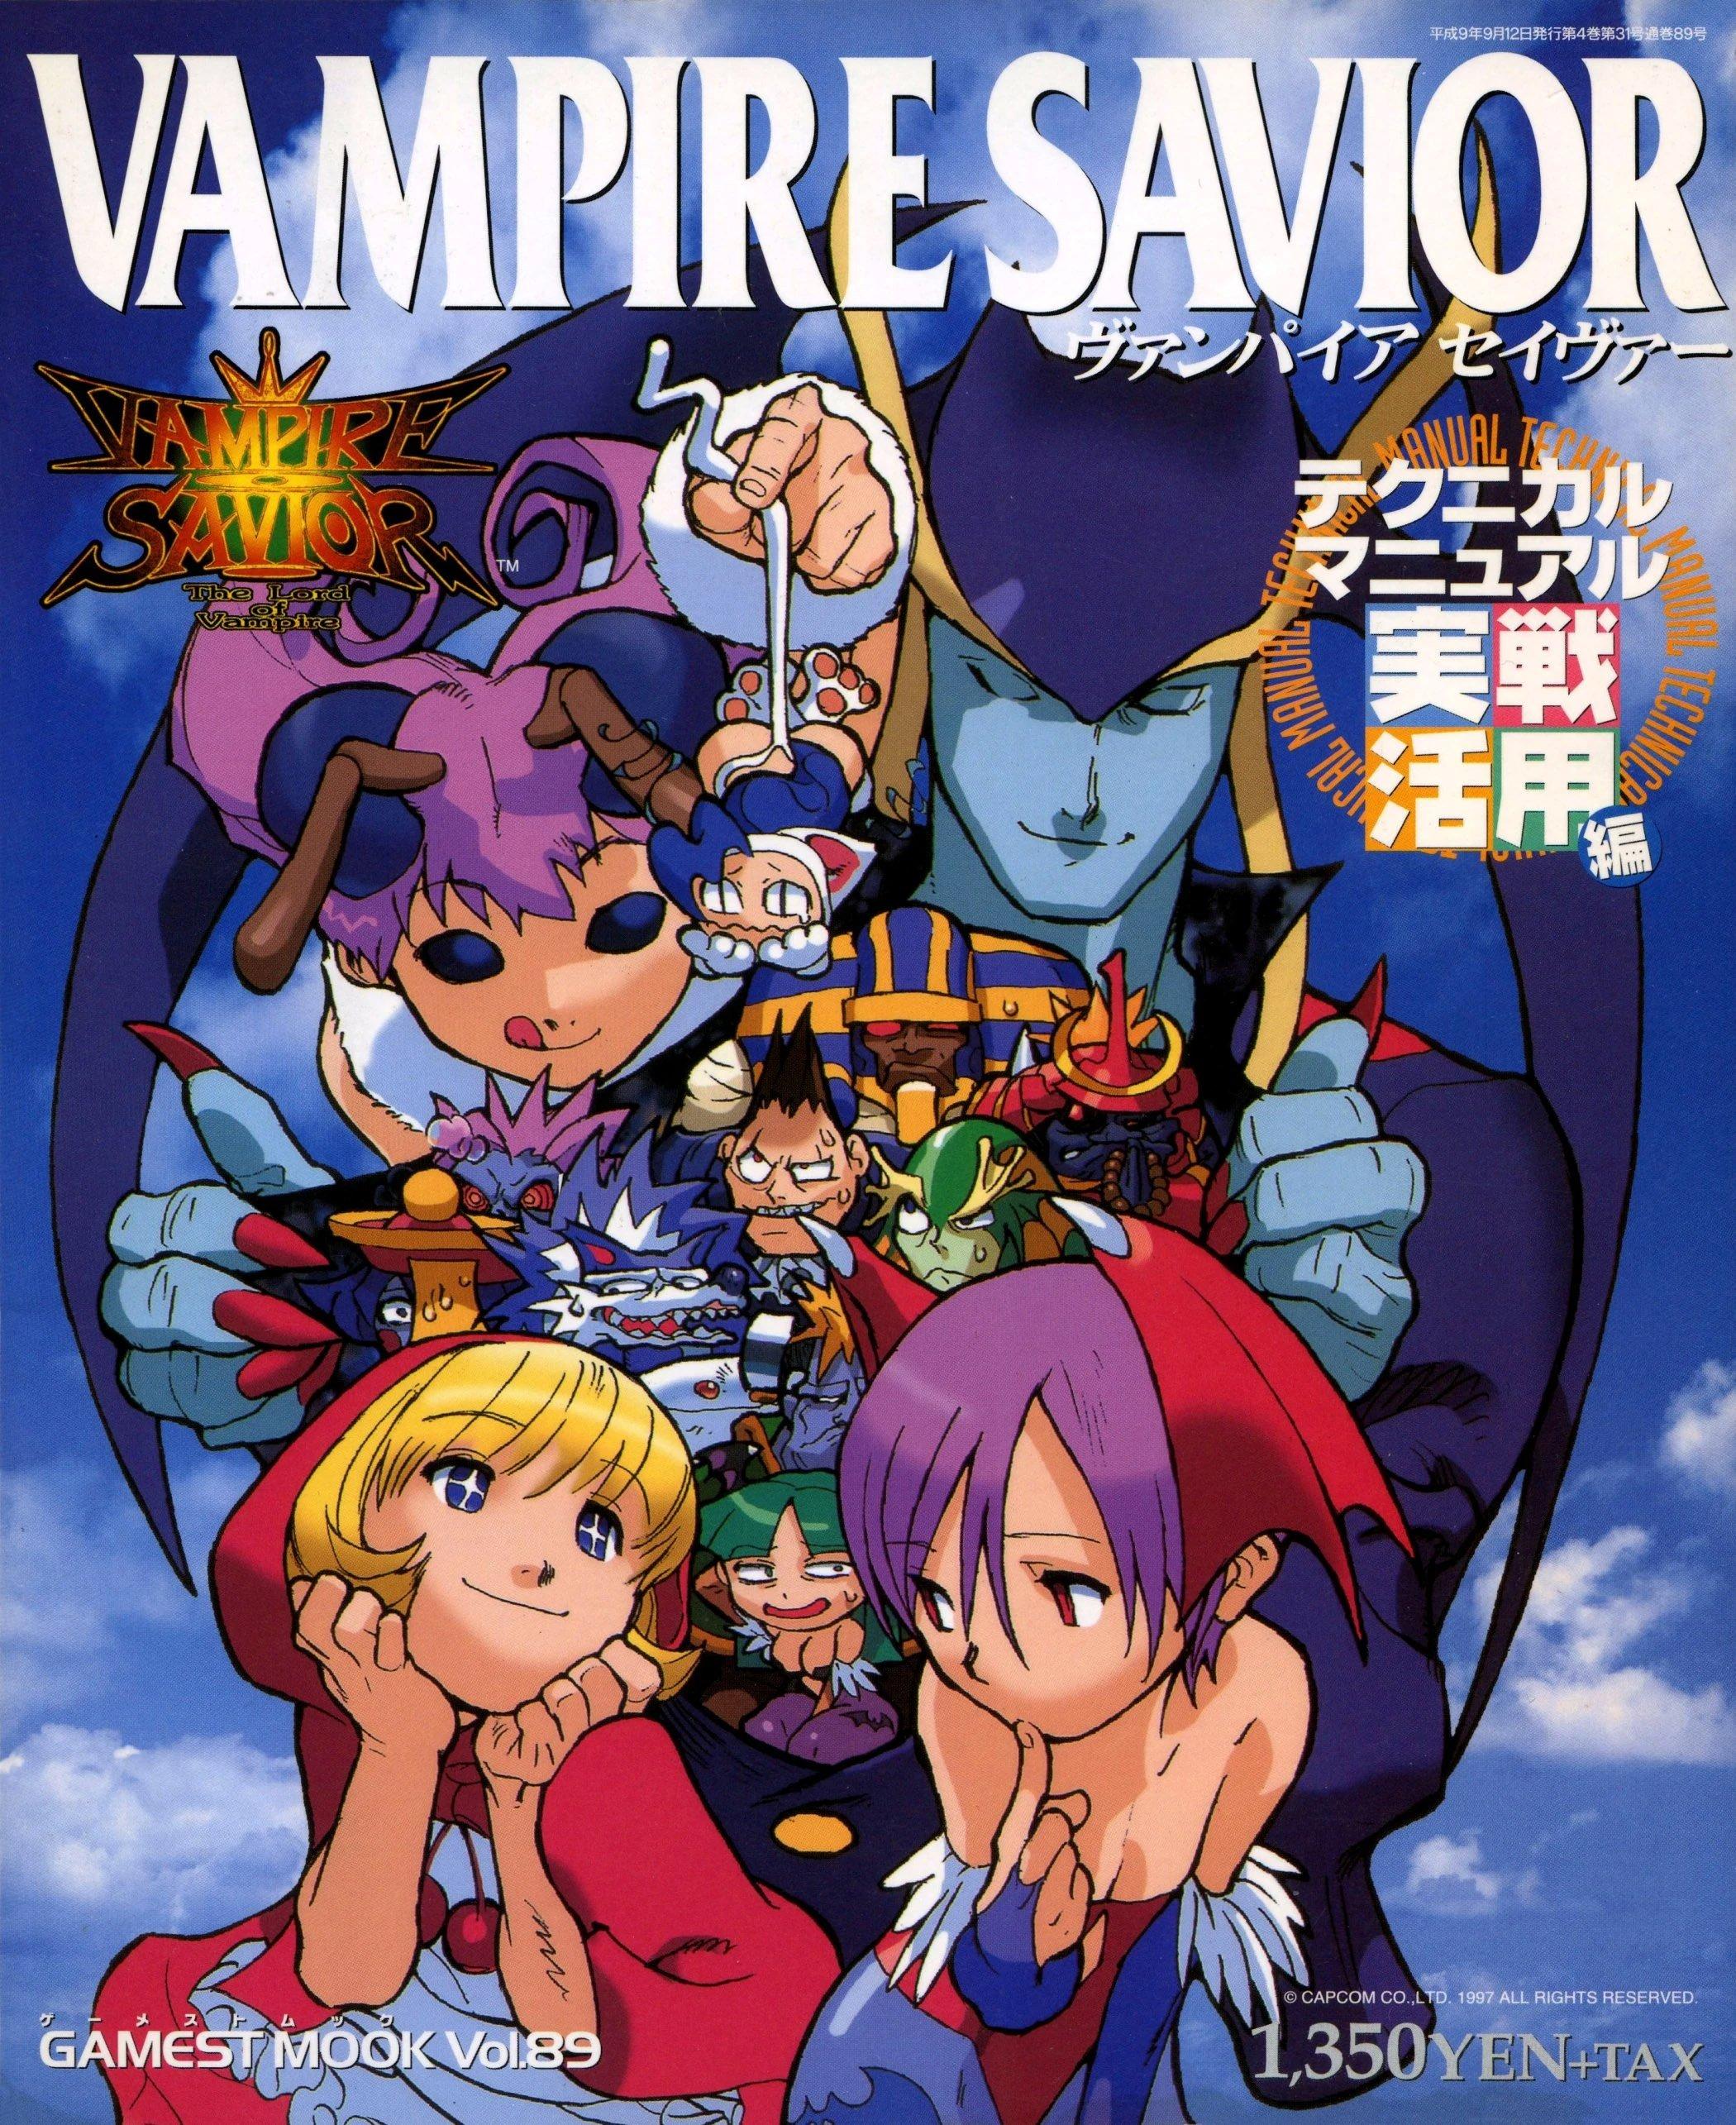 Darkstalkers - Vampire Savior Technical Manual Kisochishiki Hen